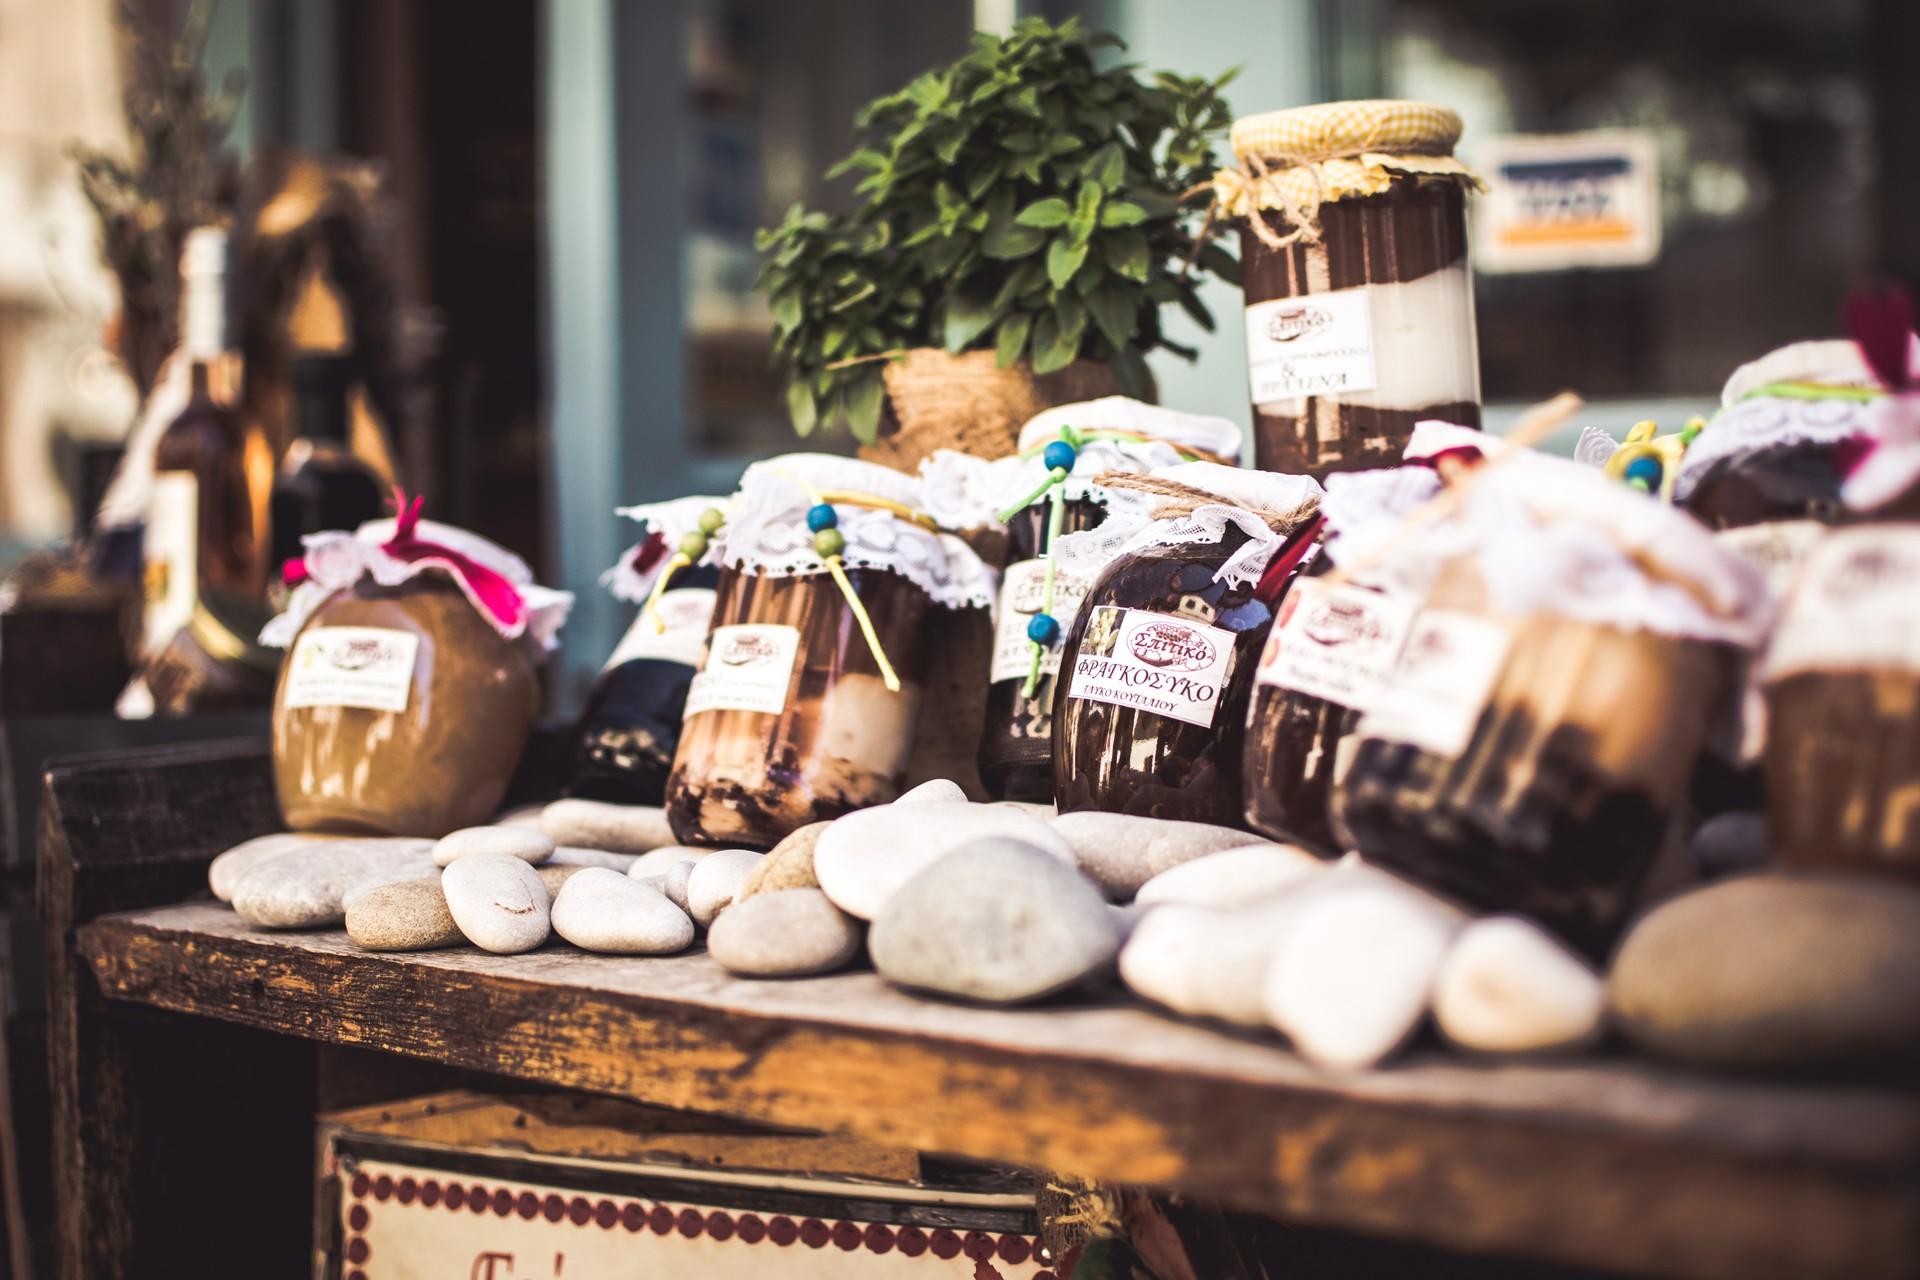 Greece jams market stall